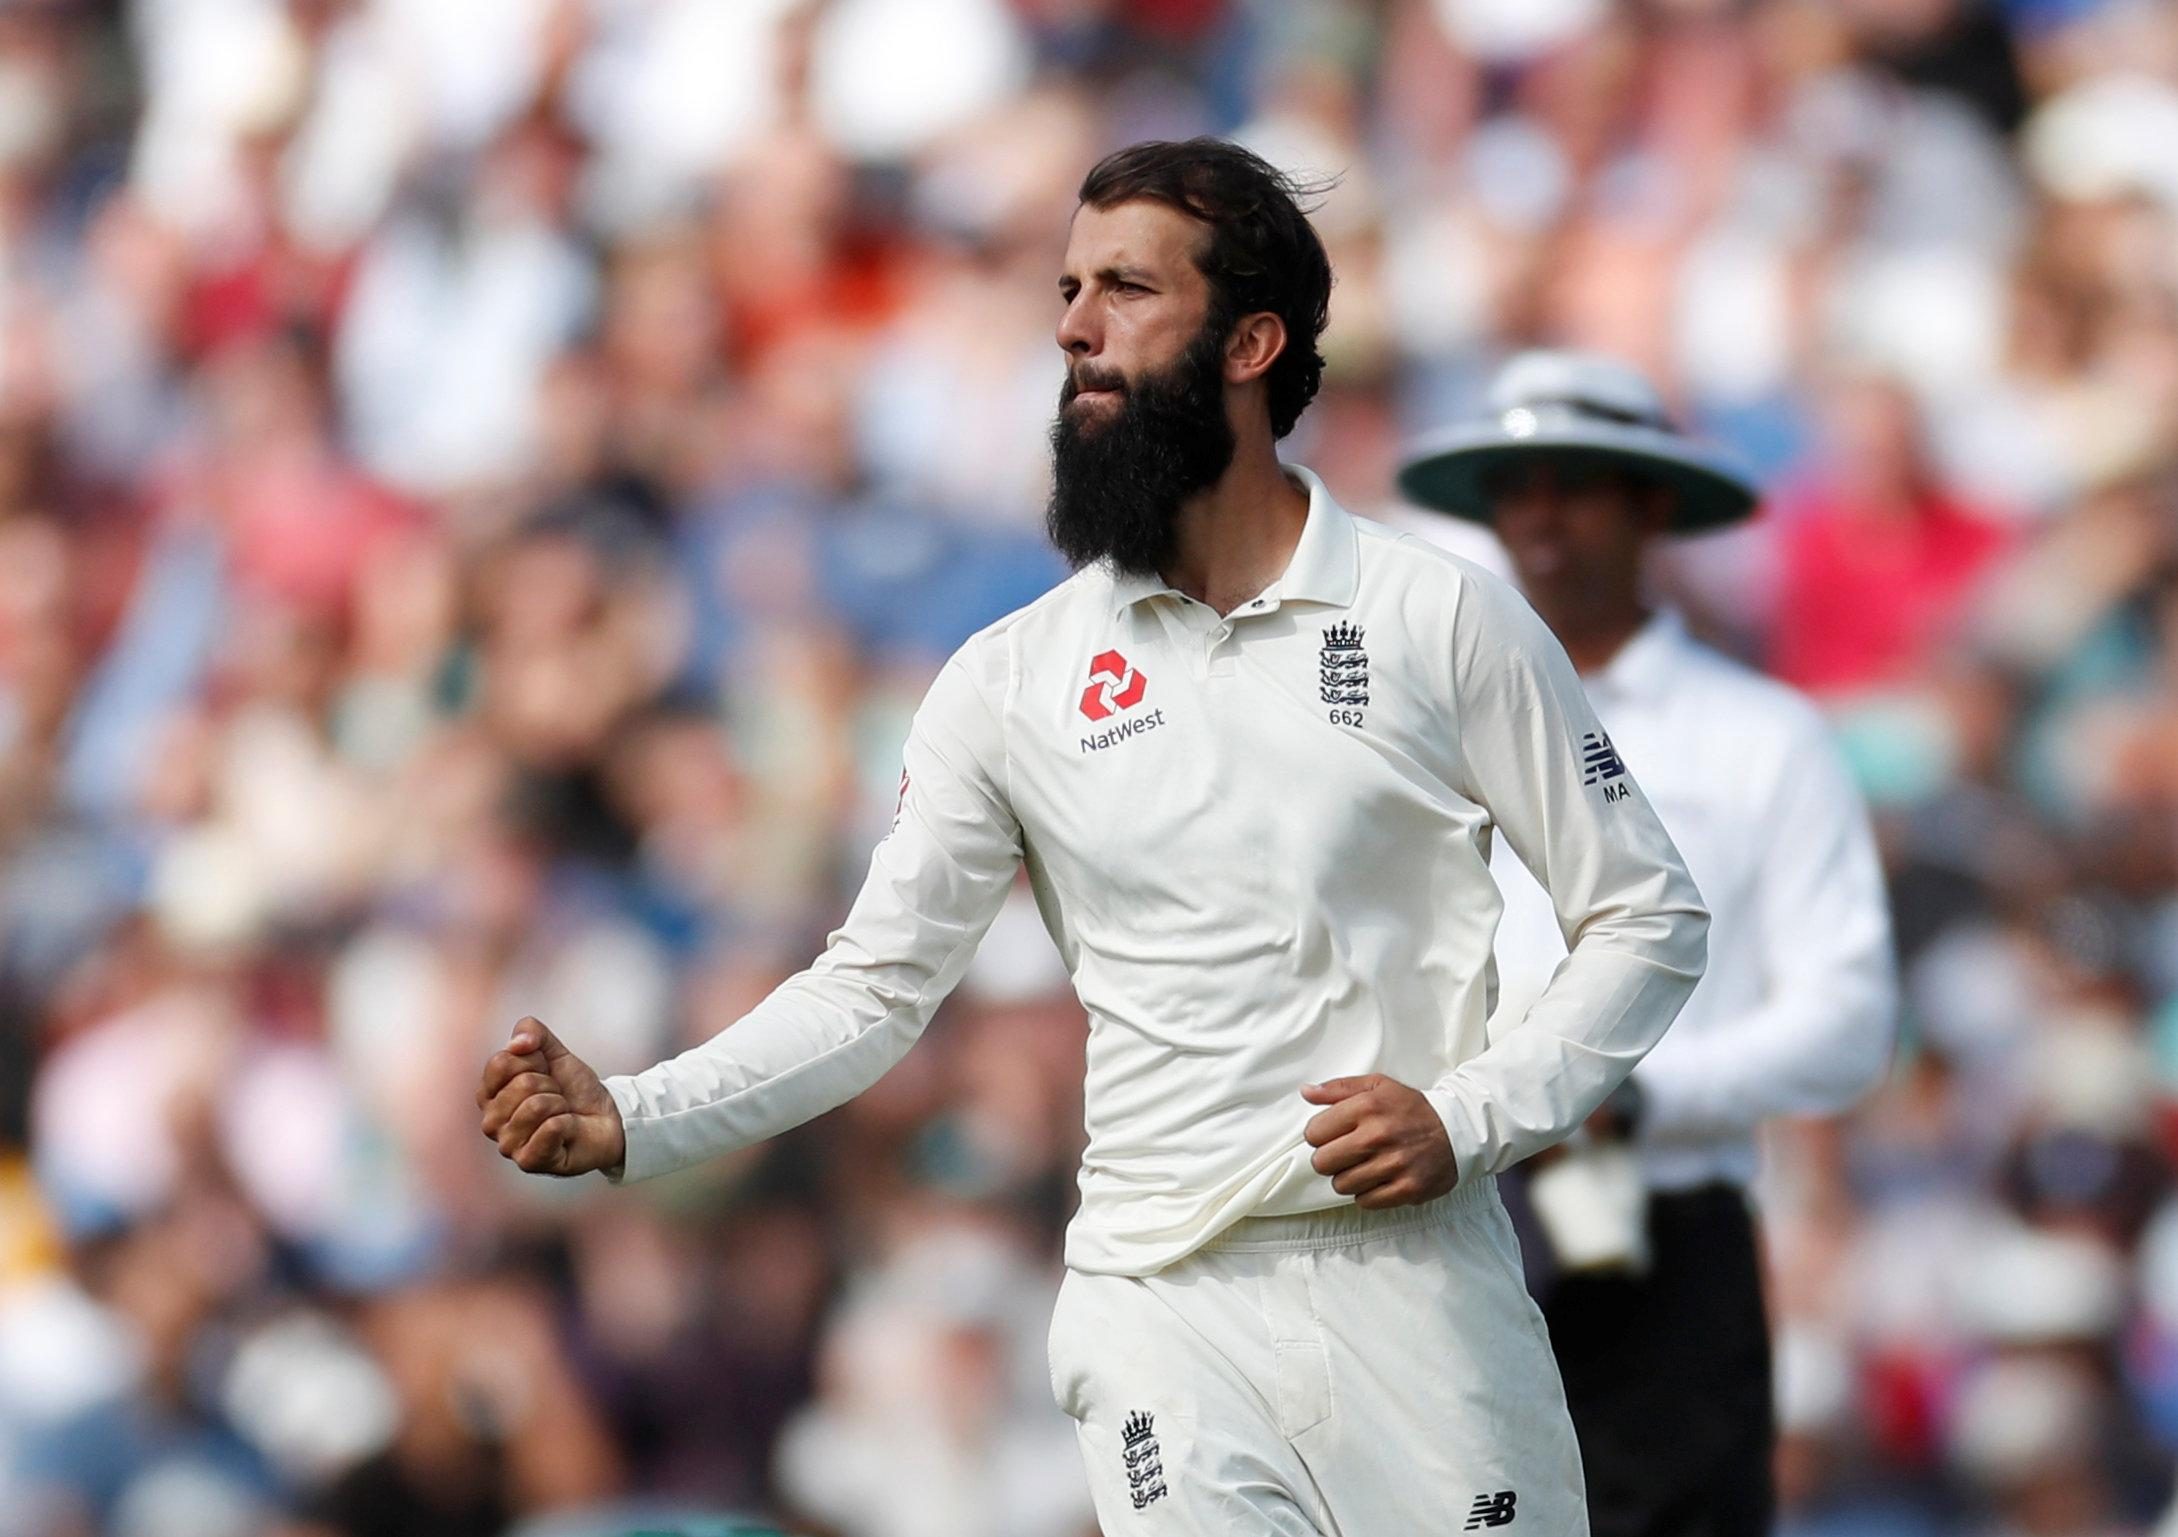 Moeen Ali claims an Australia cricketer called him 'Osama'